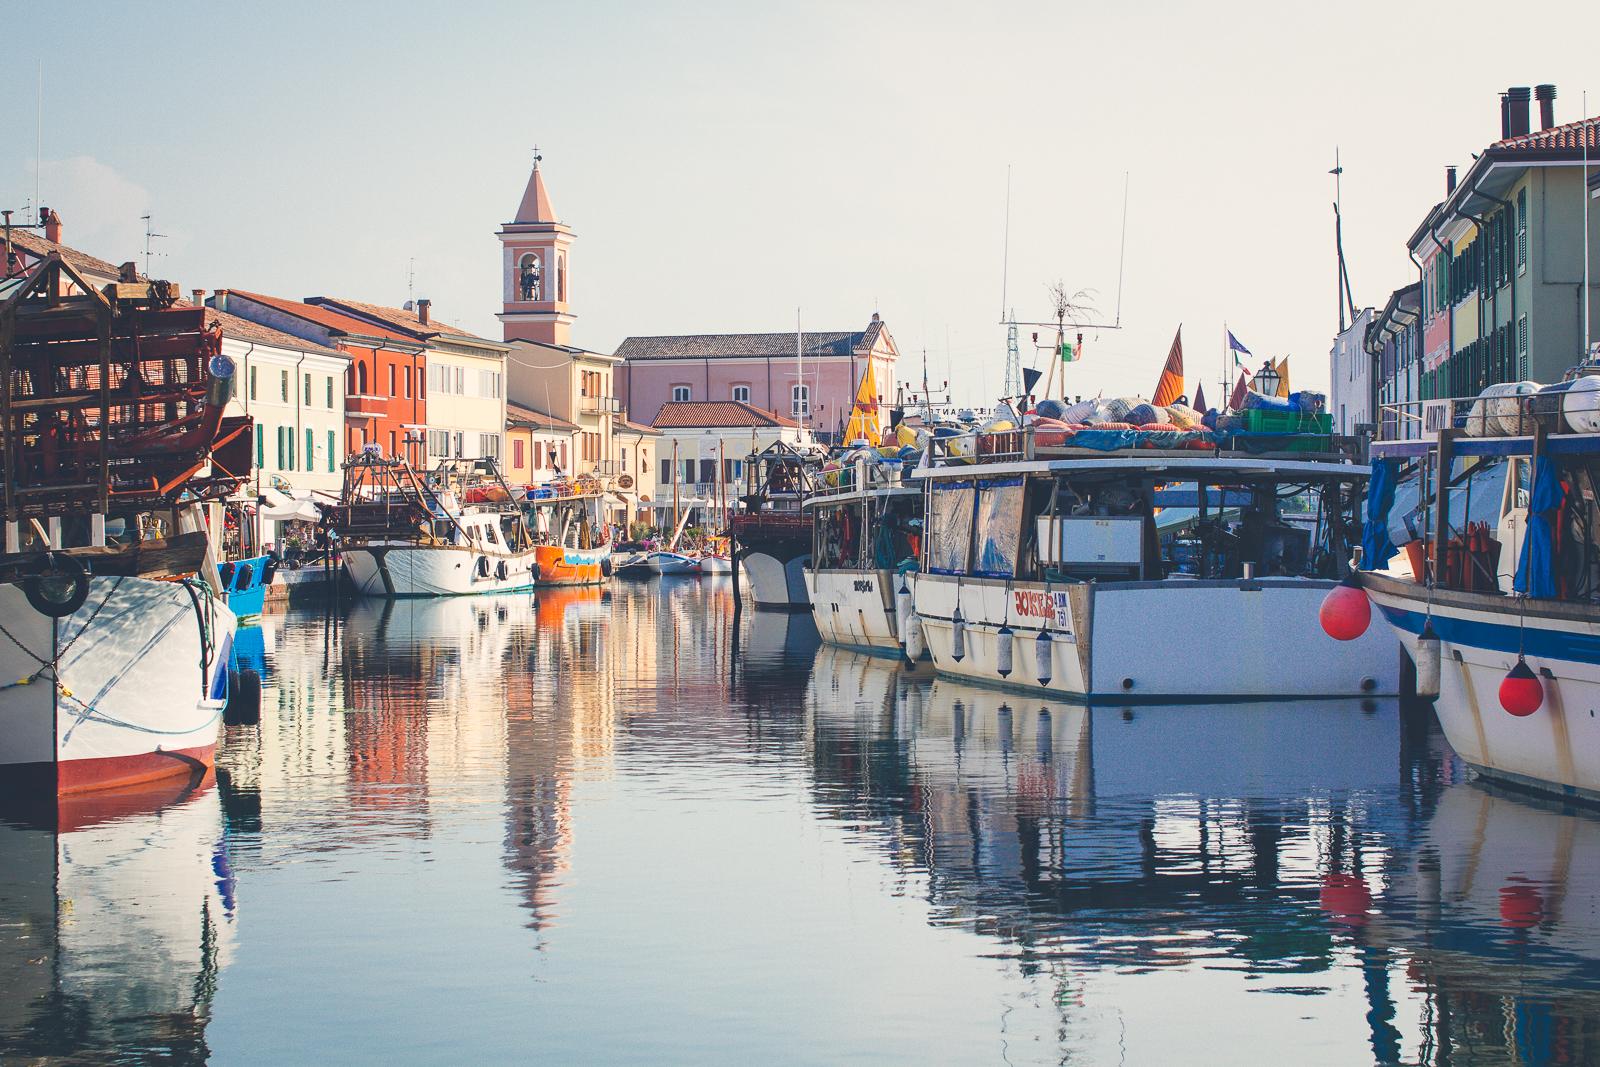 The fishing fleet on Porto Canale Leonardesco